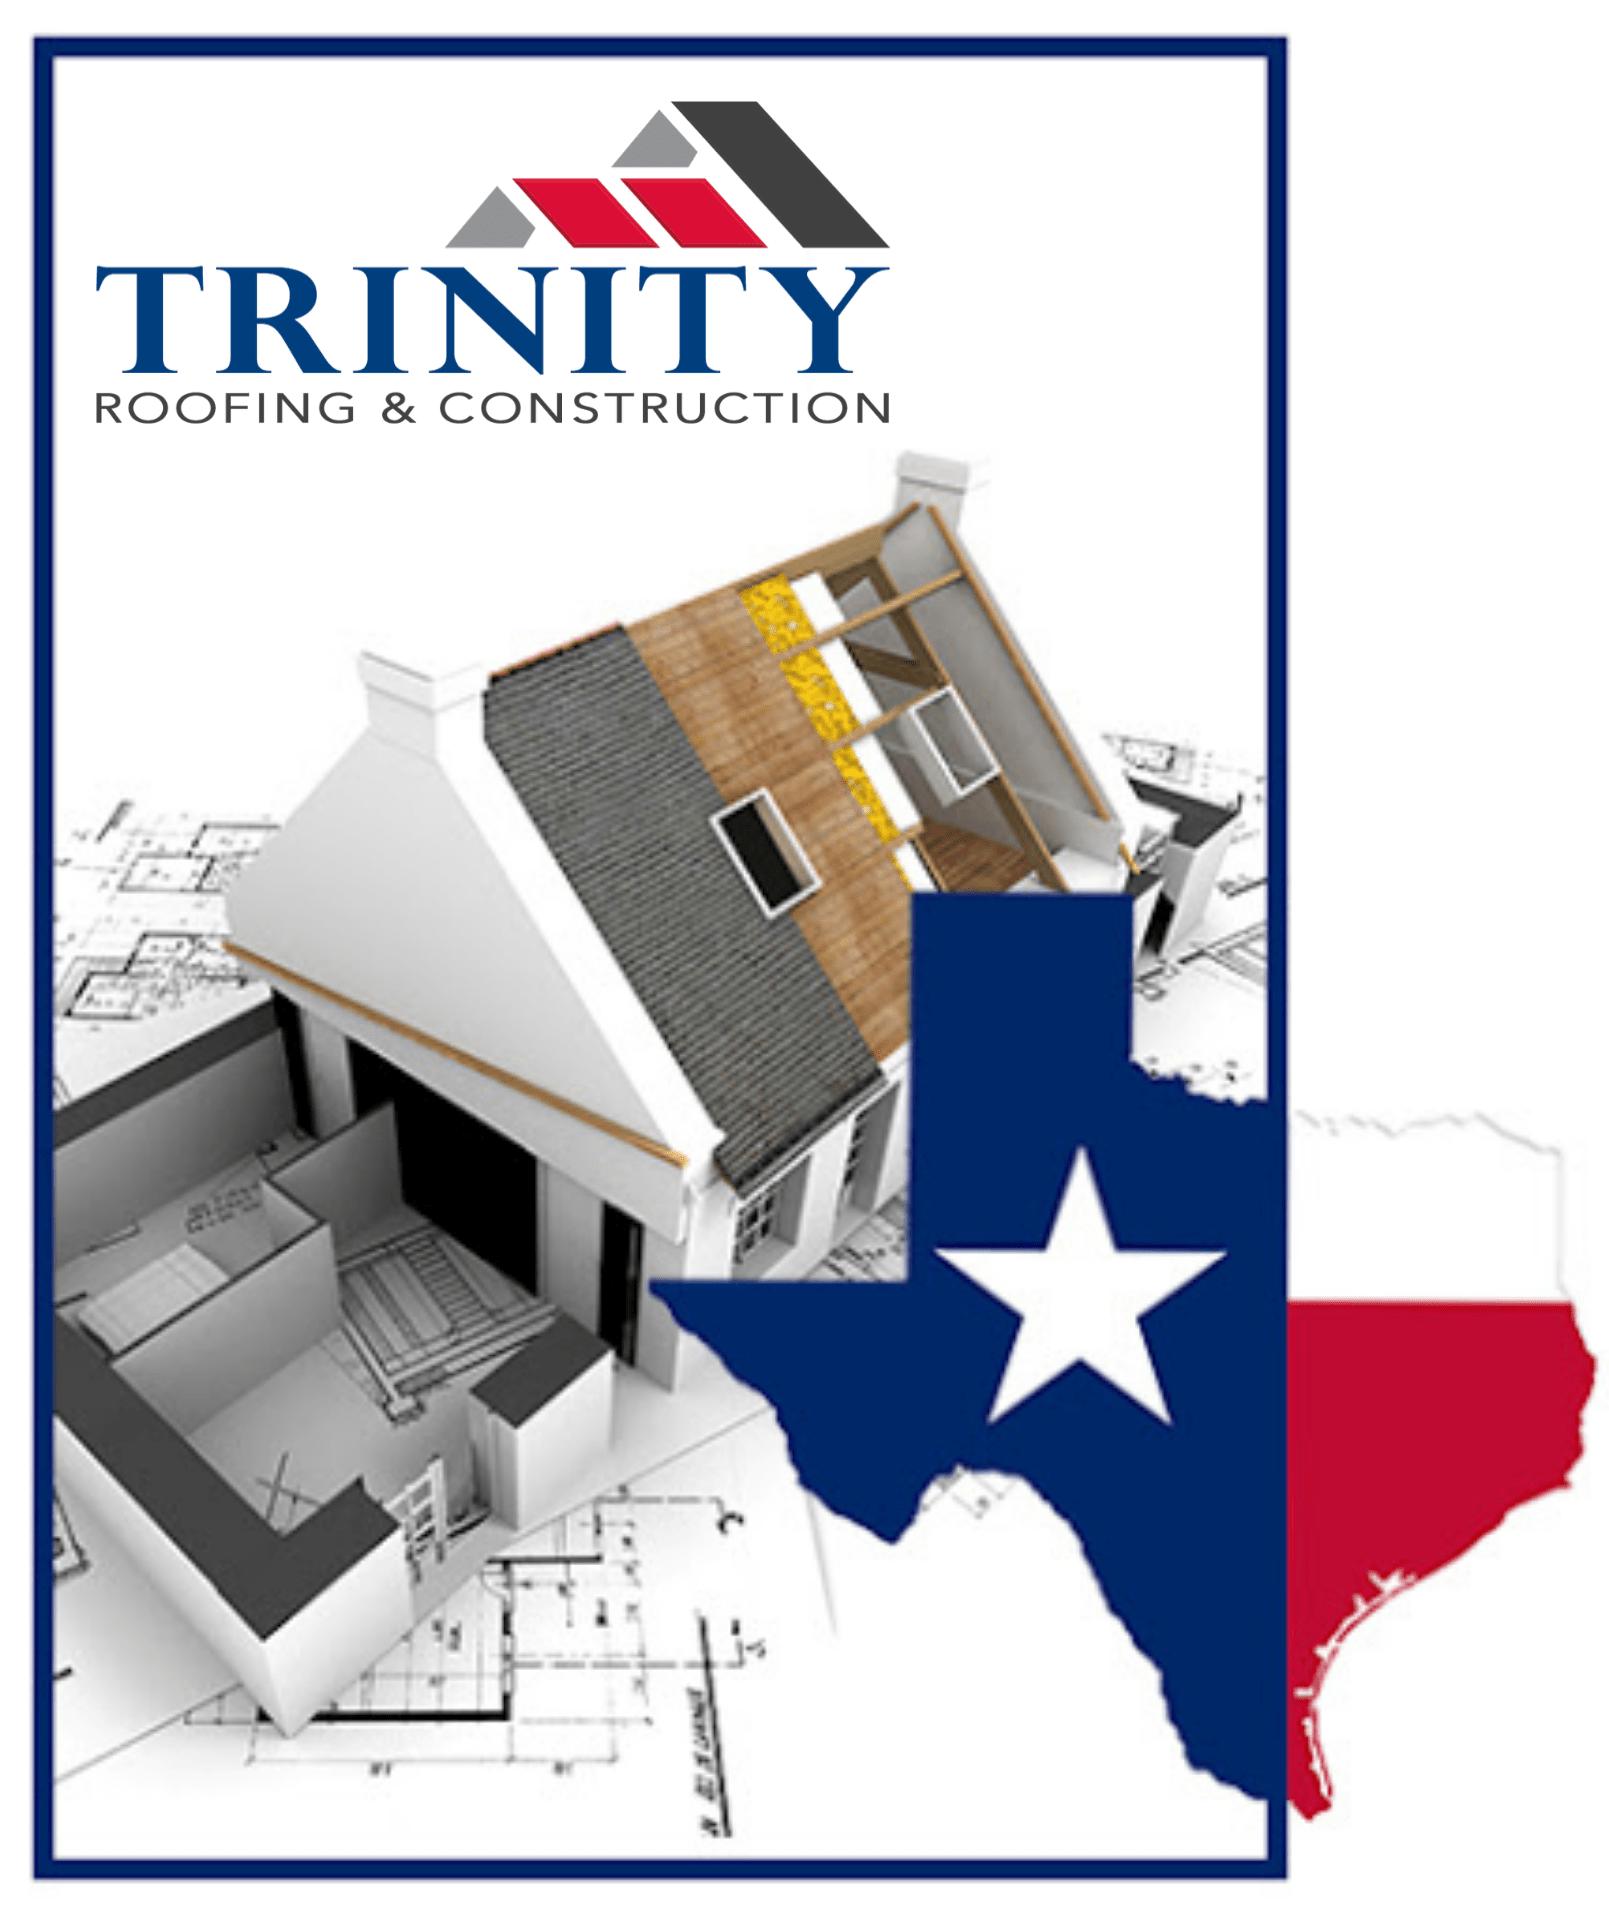 Roofing Company in Dallas